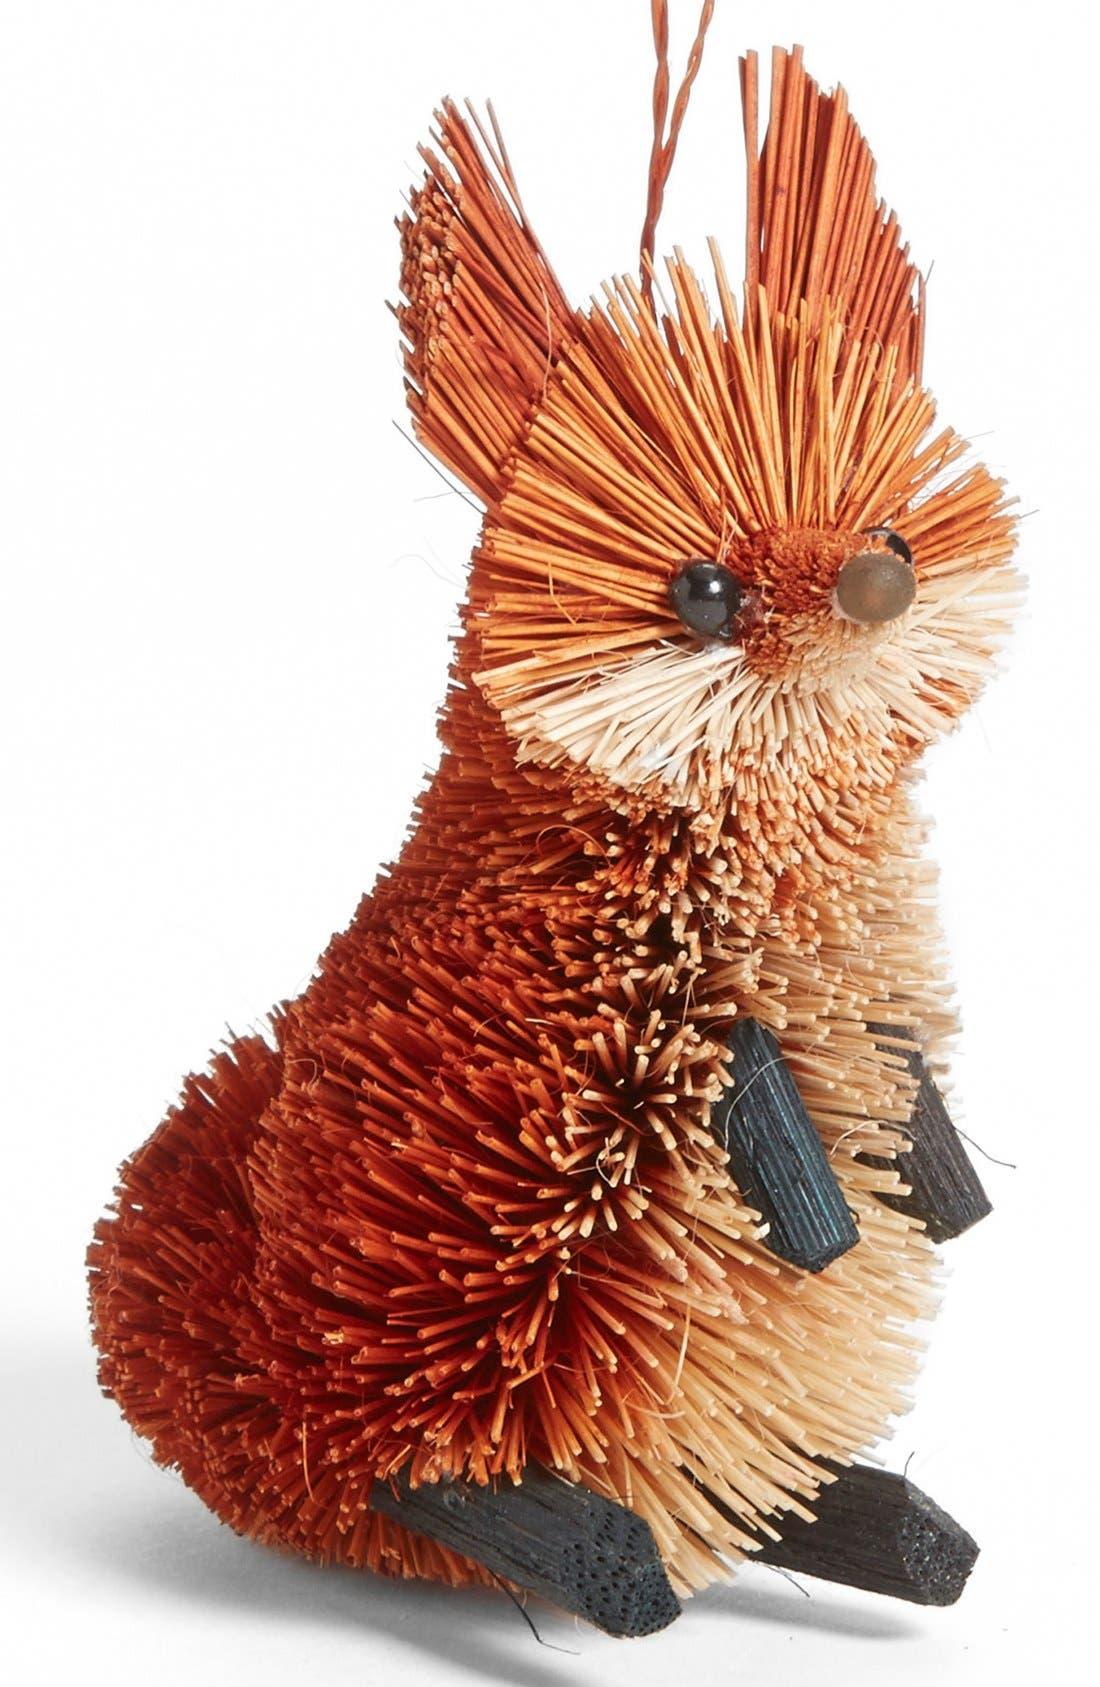 Alternate Image 1 Selected - Asmyca Fox Ornament